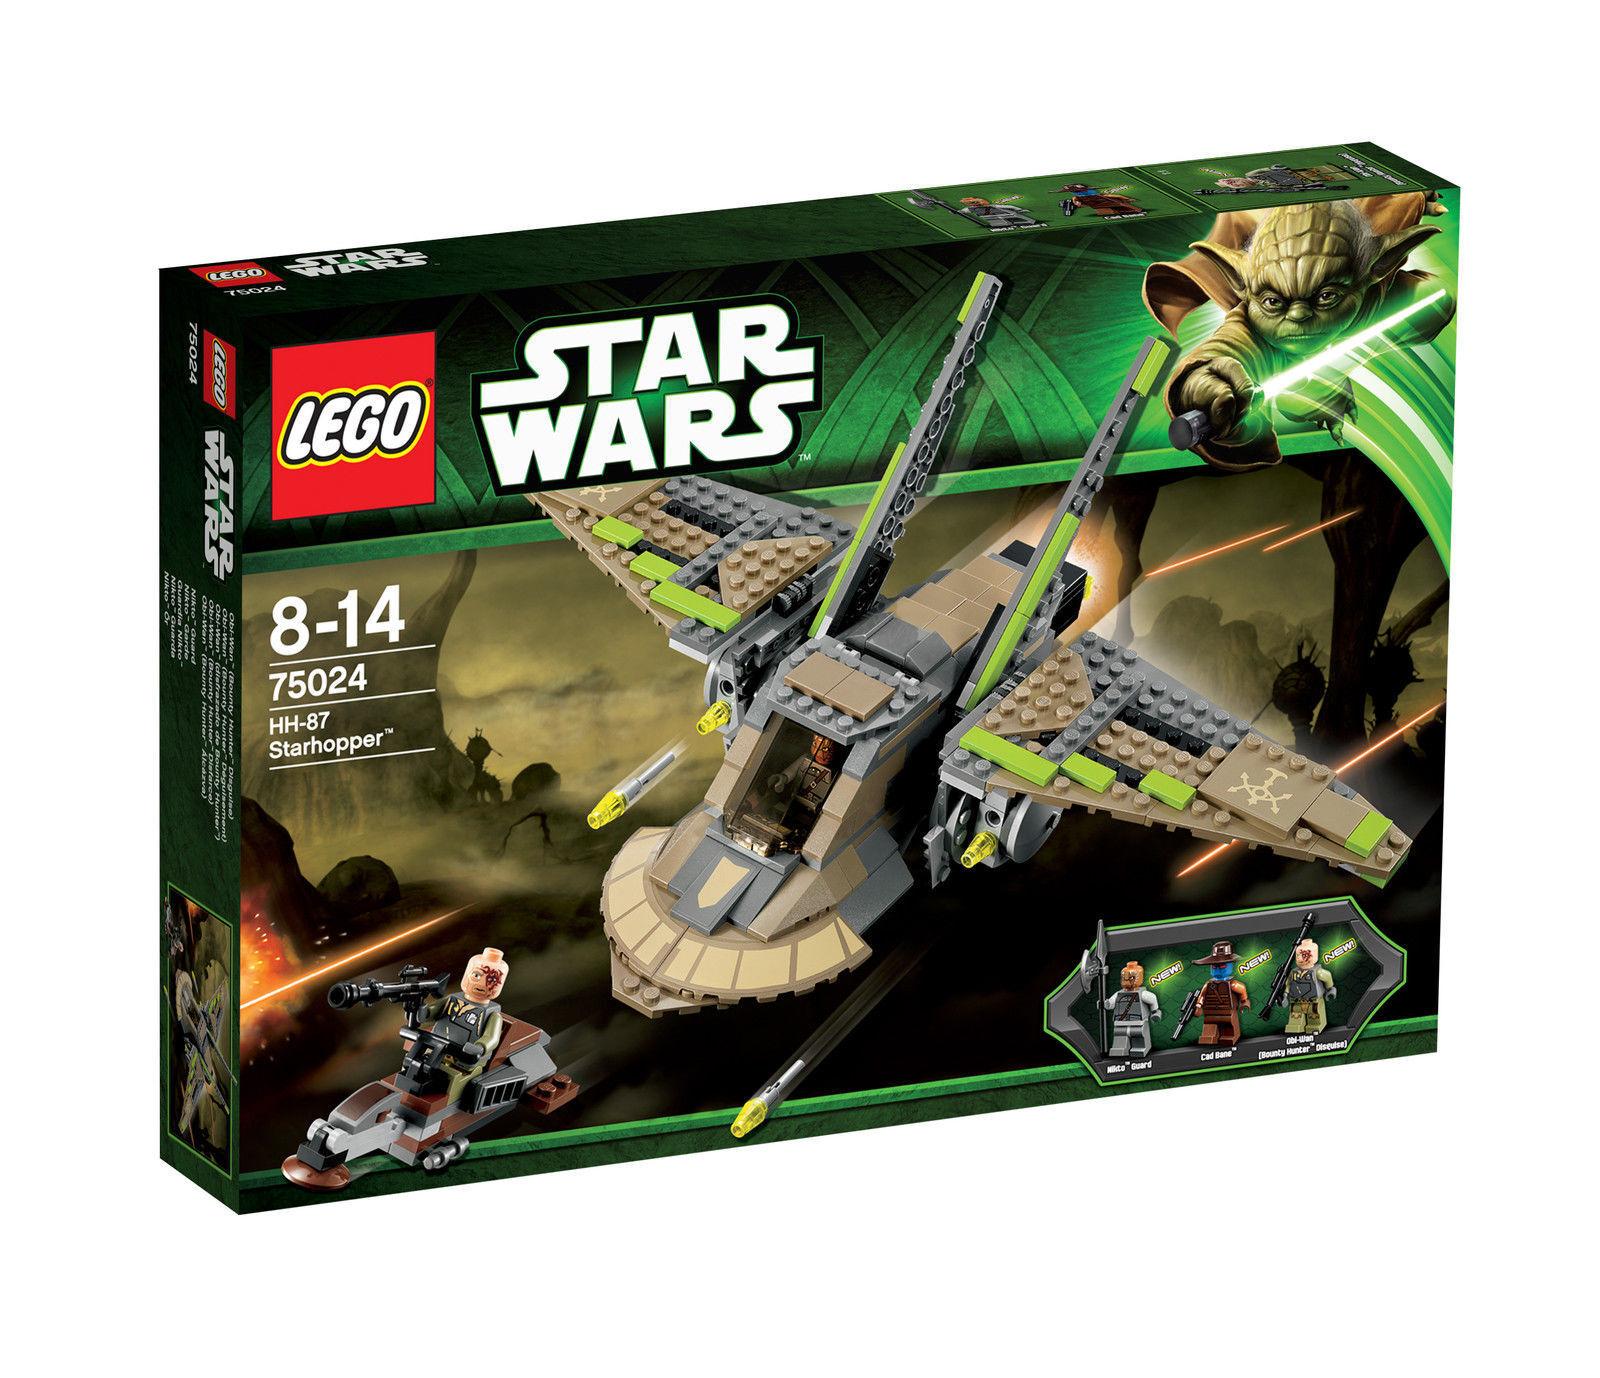 LEGO Star Wars hh-87 Starhopper  75024